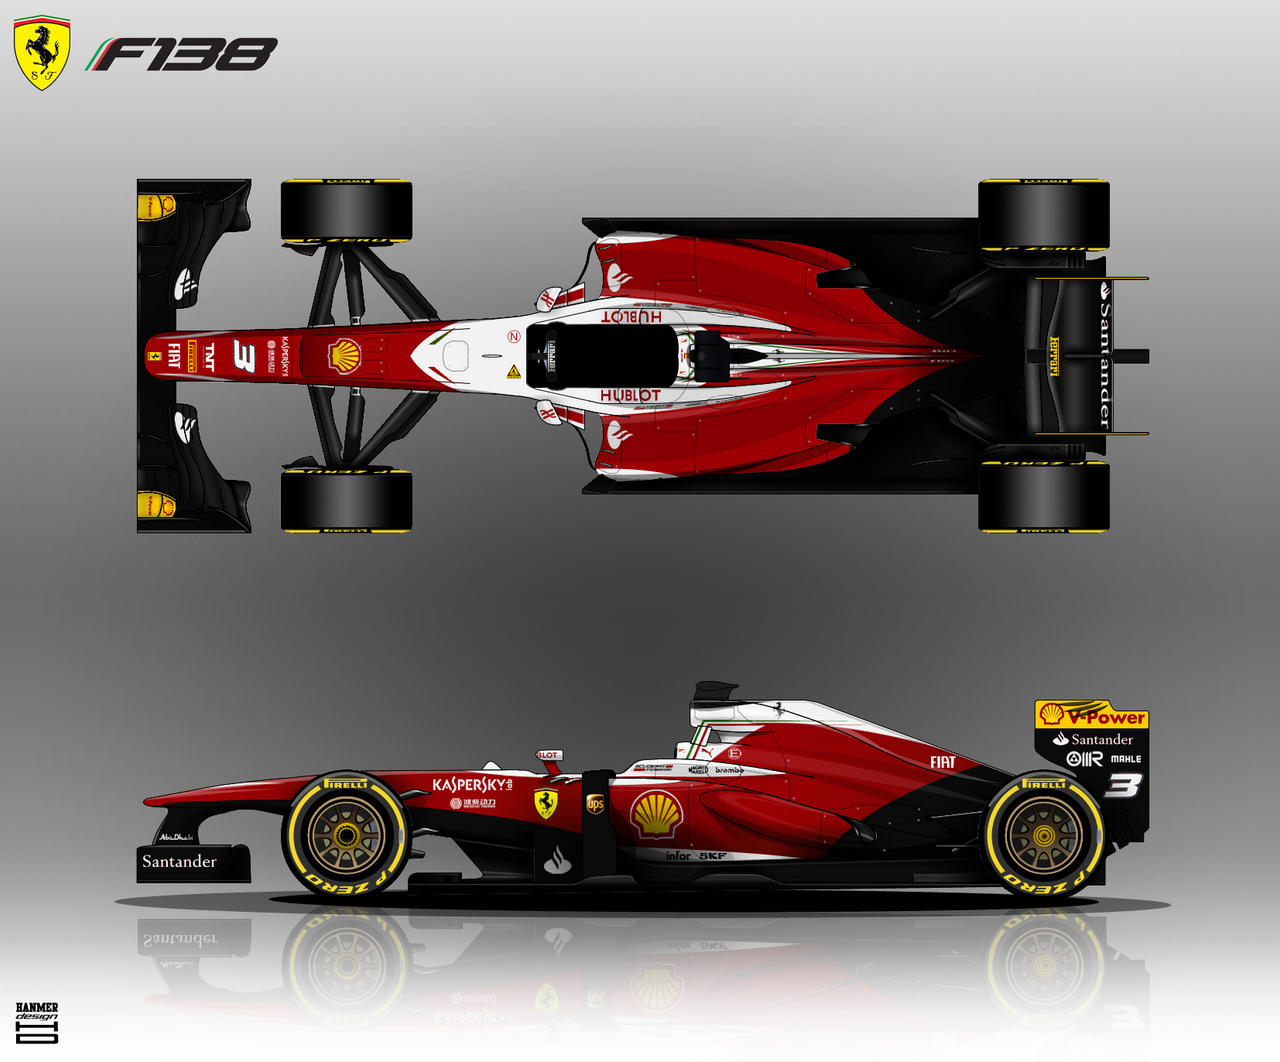 Ferrari F138 by hanmer